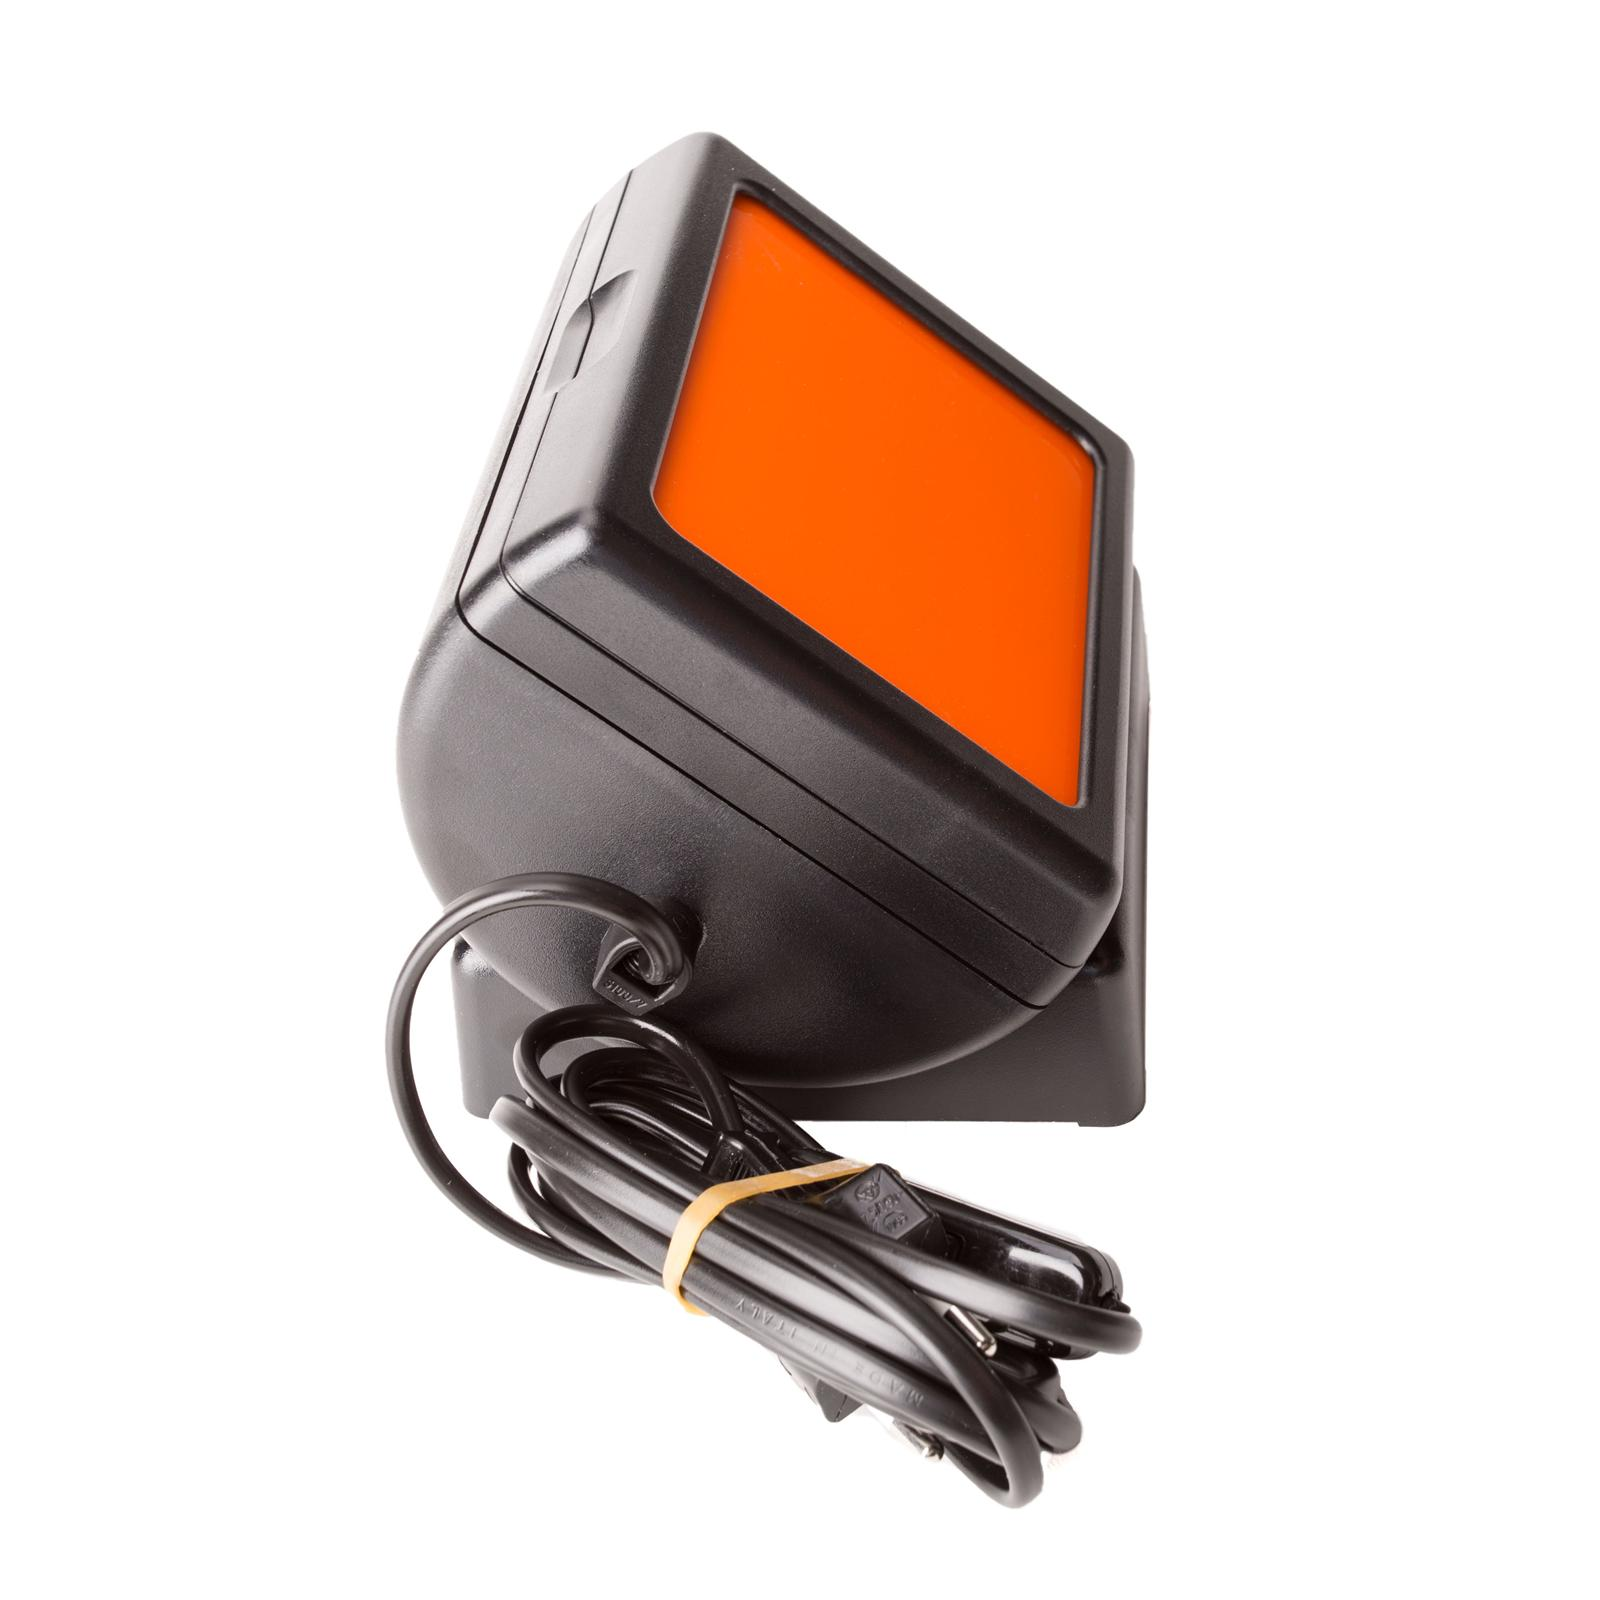 kaiser dunkelkammer leuchte fotolabor duka lampe 4018. Black Bedroom Furniture Sets. Home Design Ideas